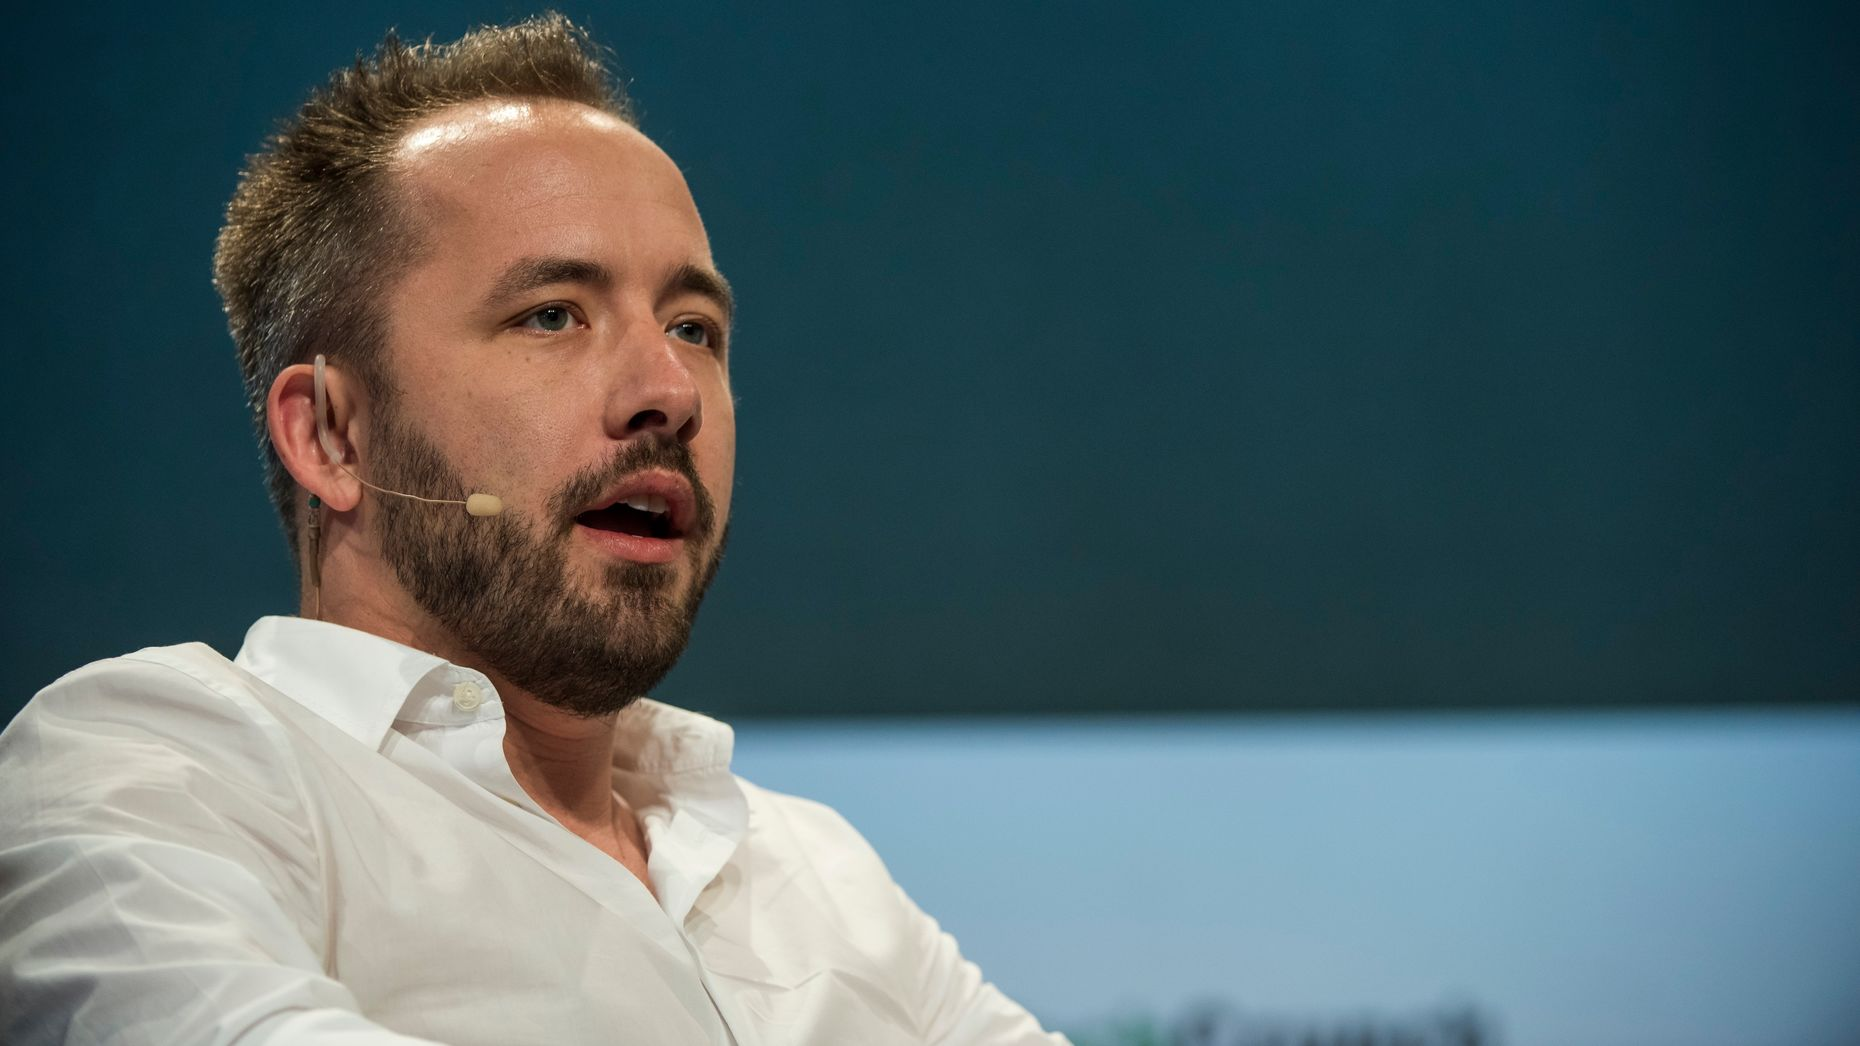 Dropbox CEO Drew Houston. Photo by Bloomberg.